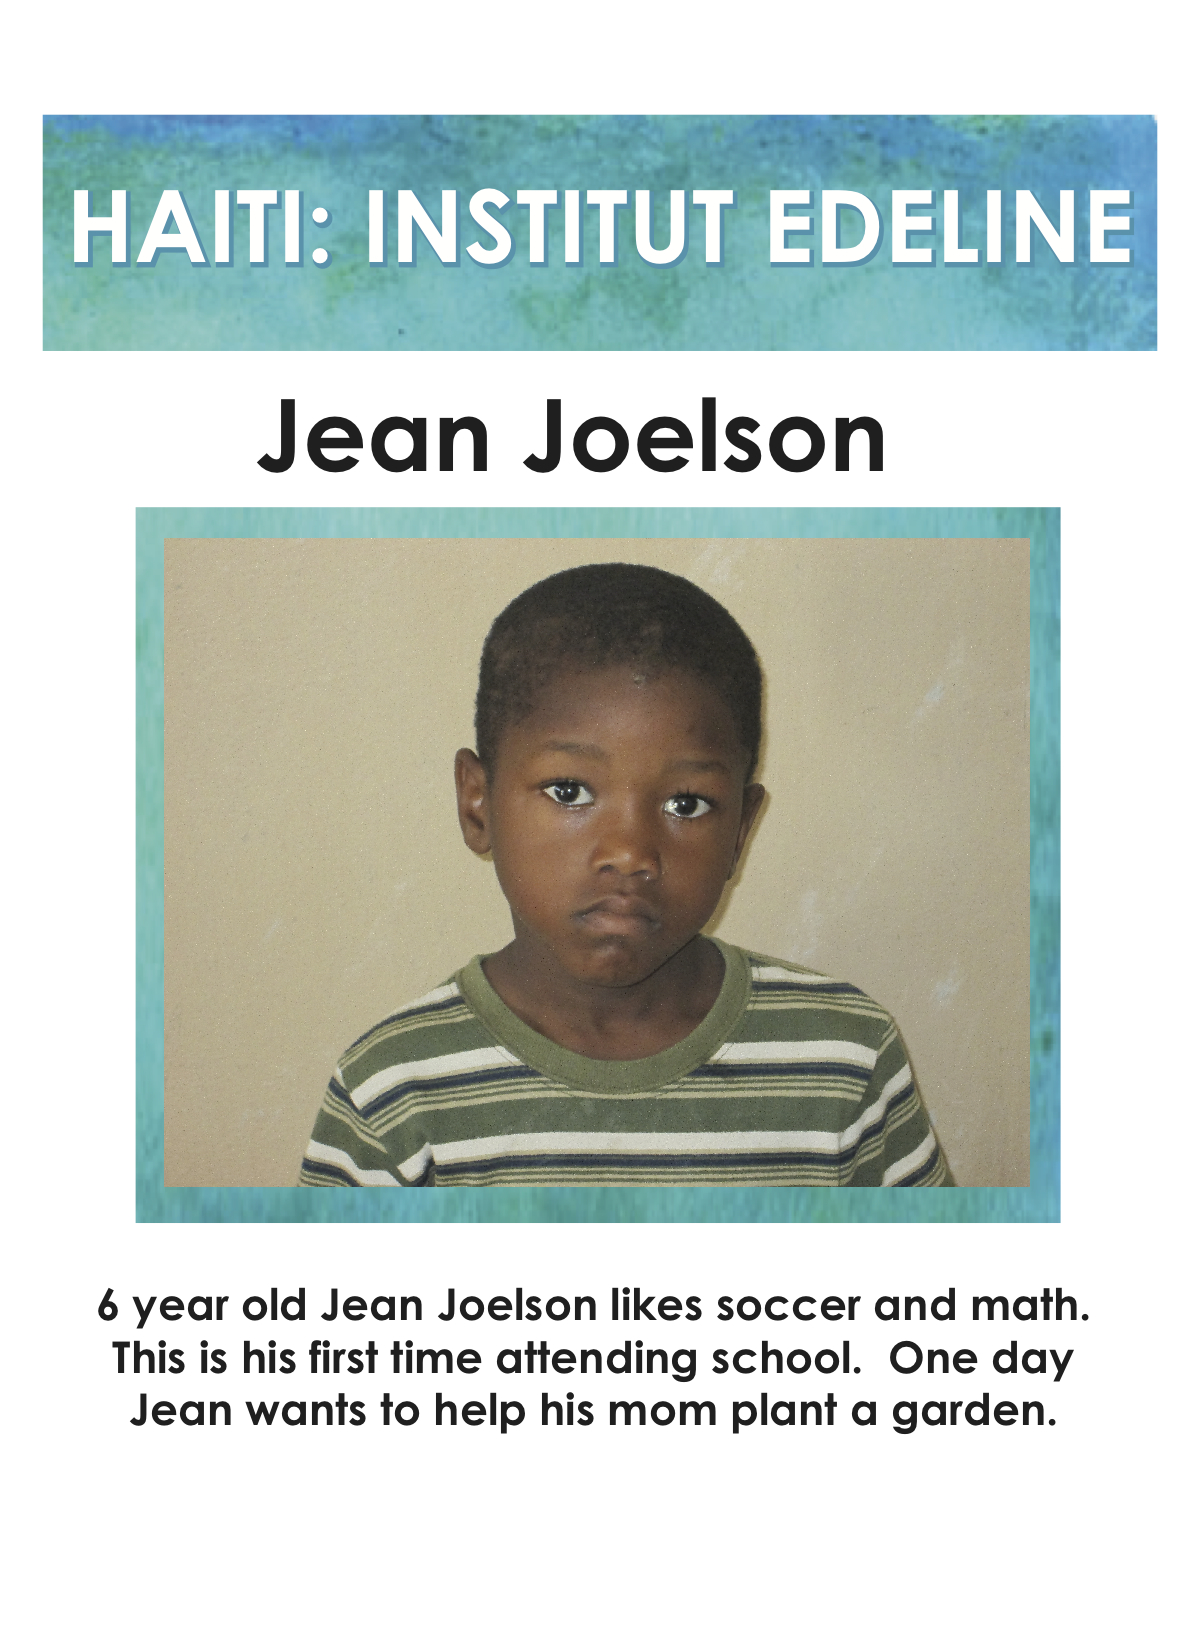 Jean Joelson.jpg